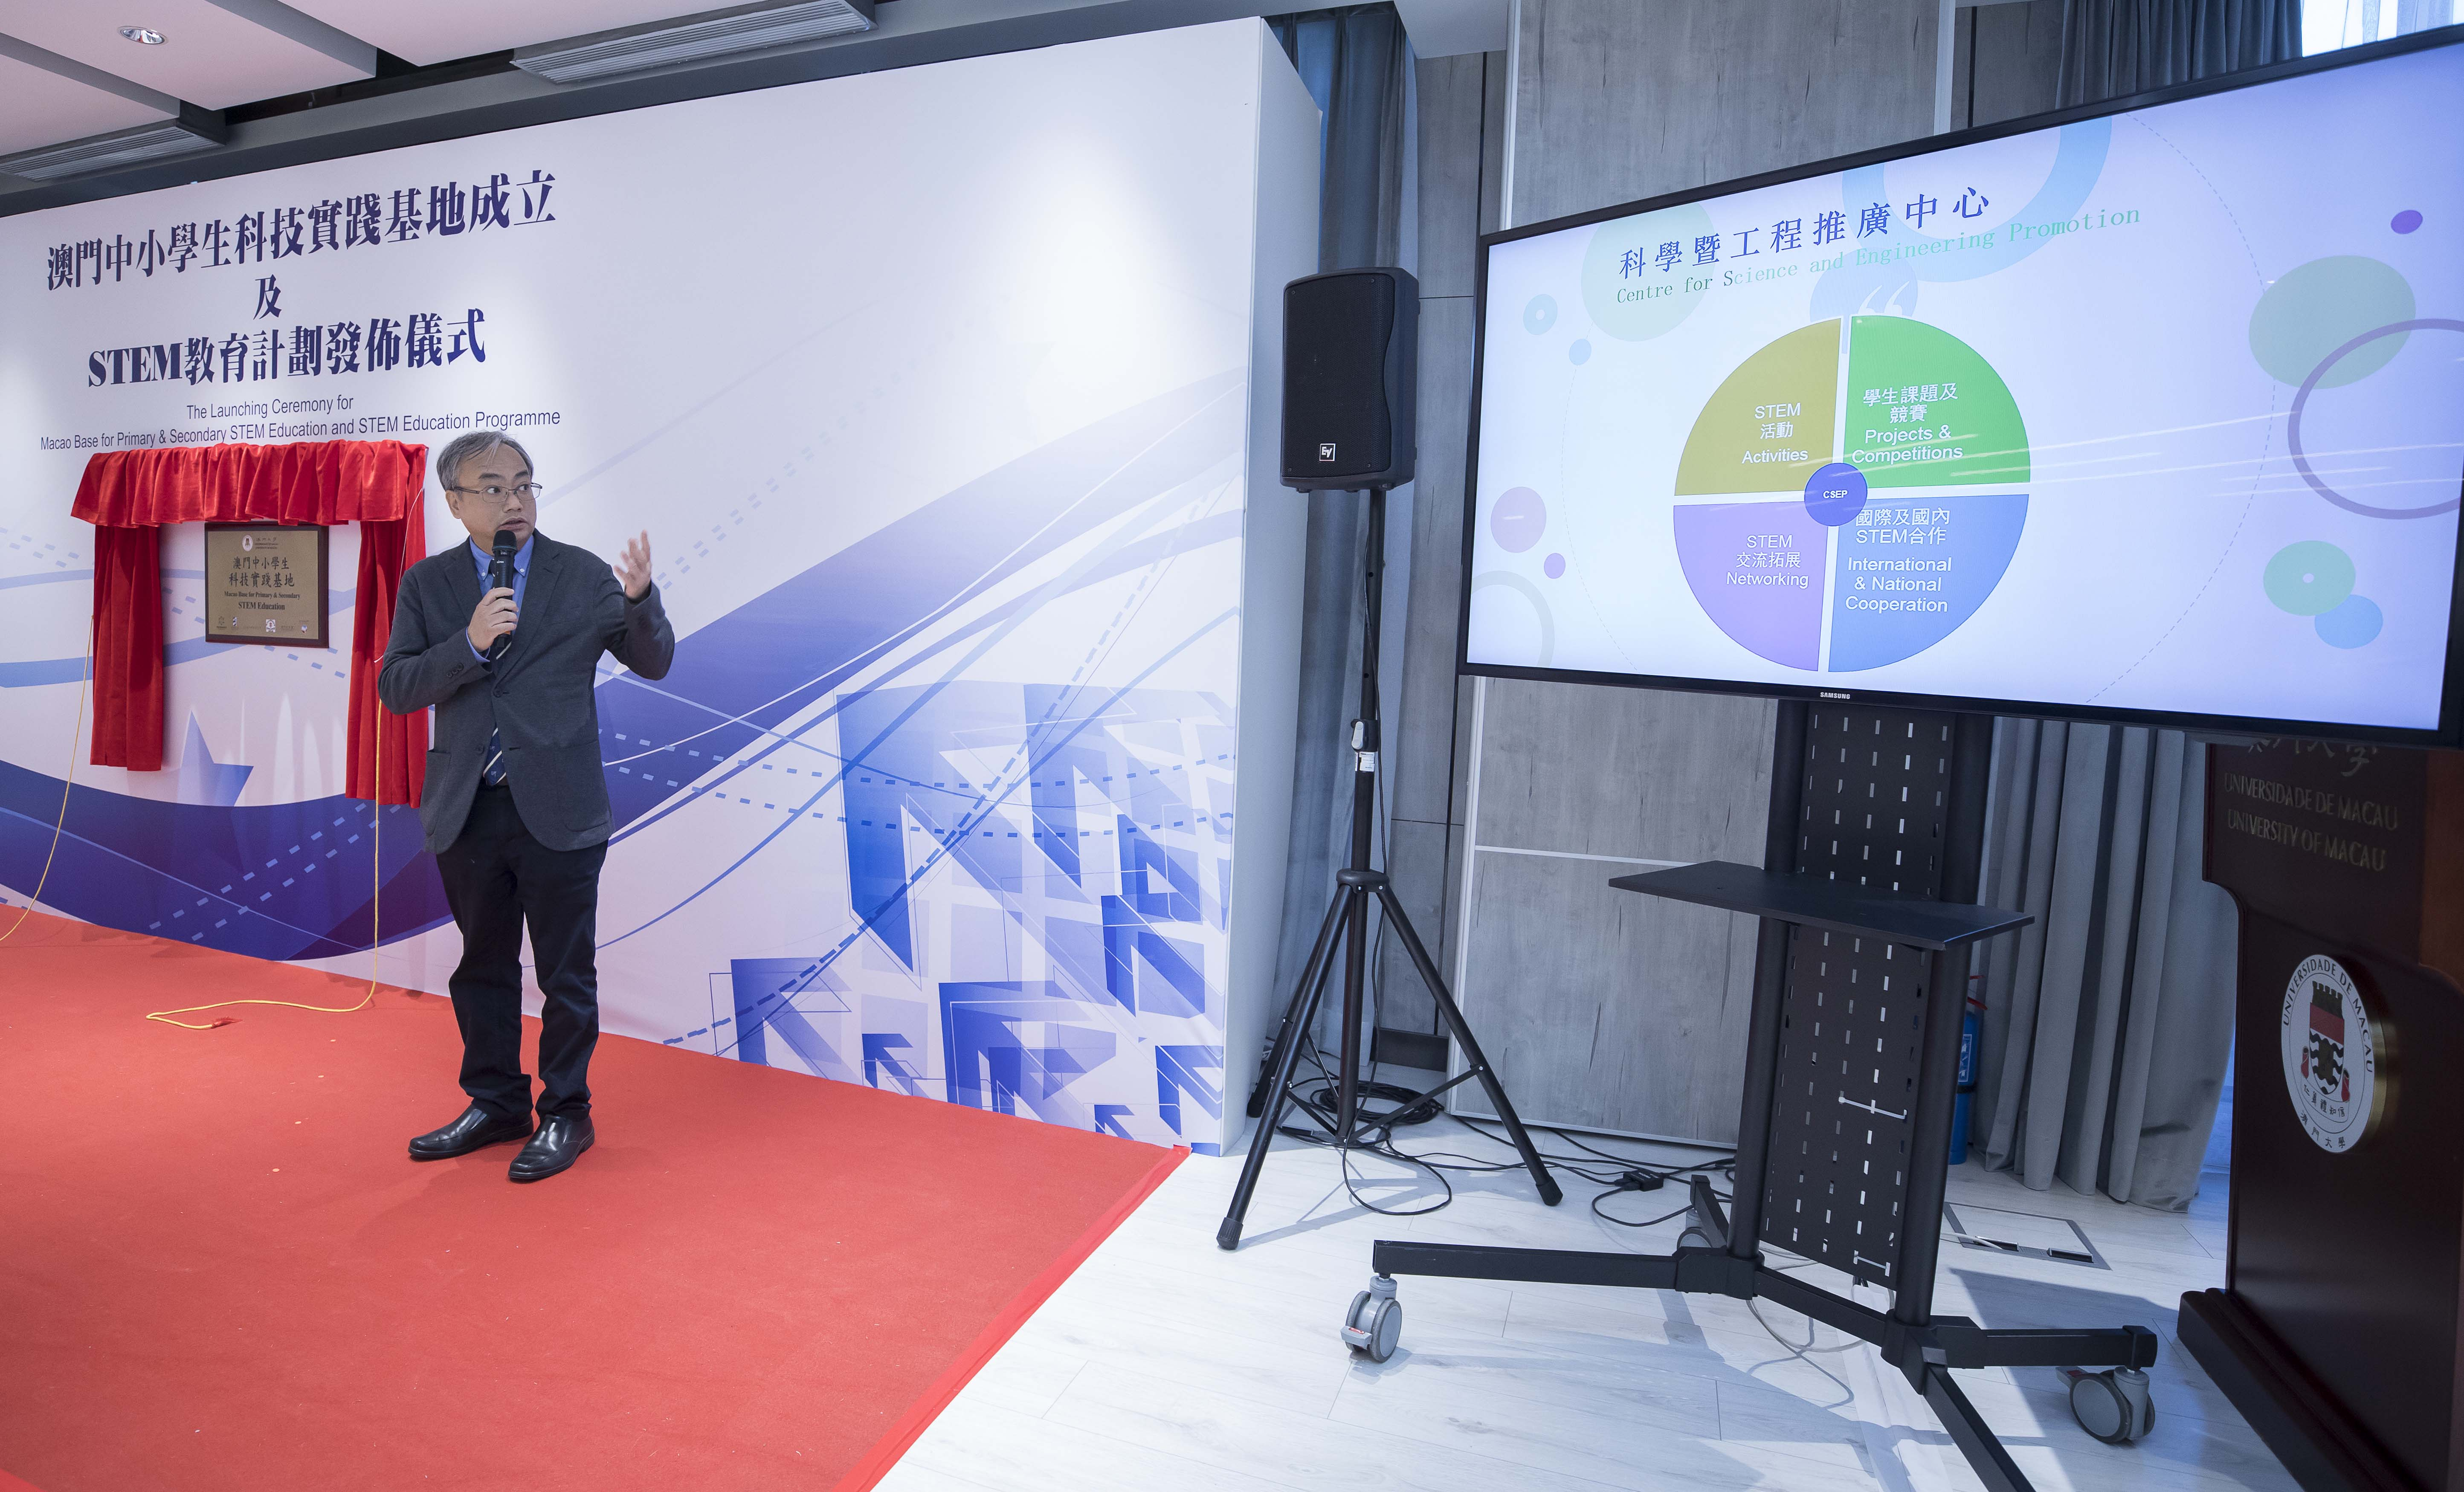 Tam Kam Weng explains the STEM Programme